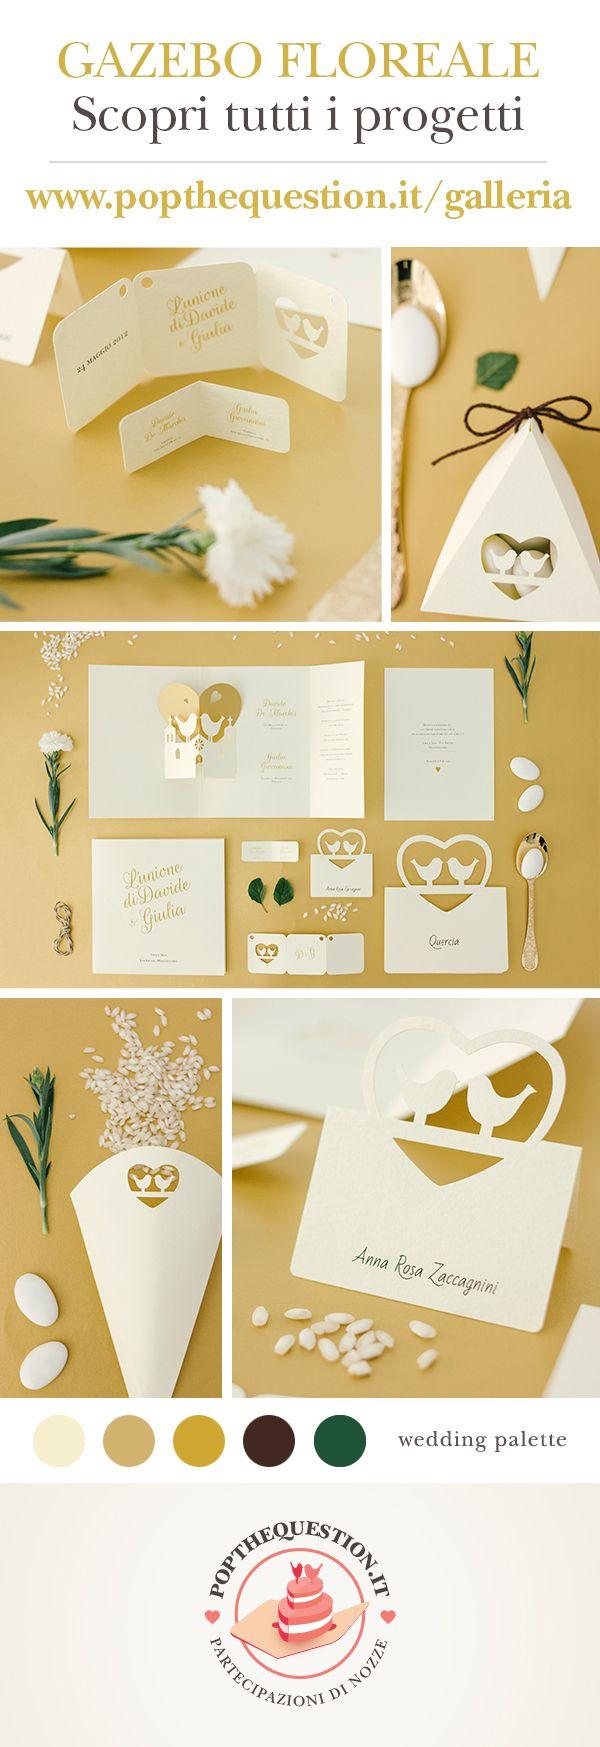 Pop-up Chiesa Oro e Avorio, Gold palette wedding! #matrimonio #popup #palette #wedding #chiesa #paper #invitation #stationary #gold #church